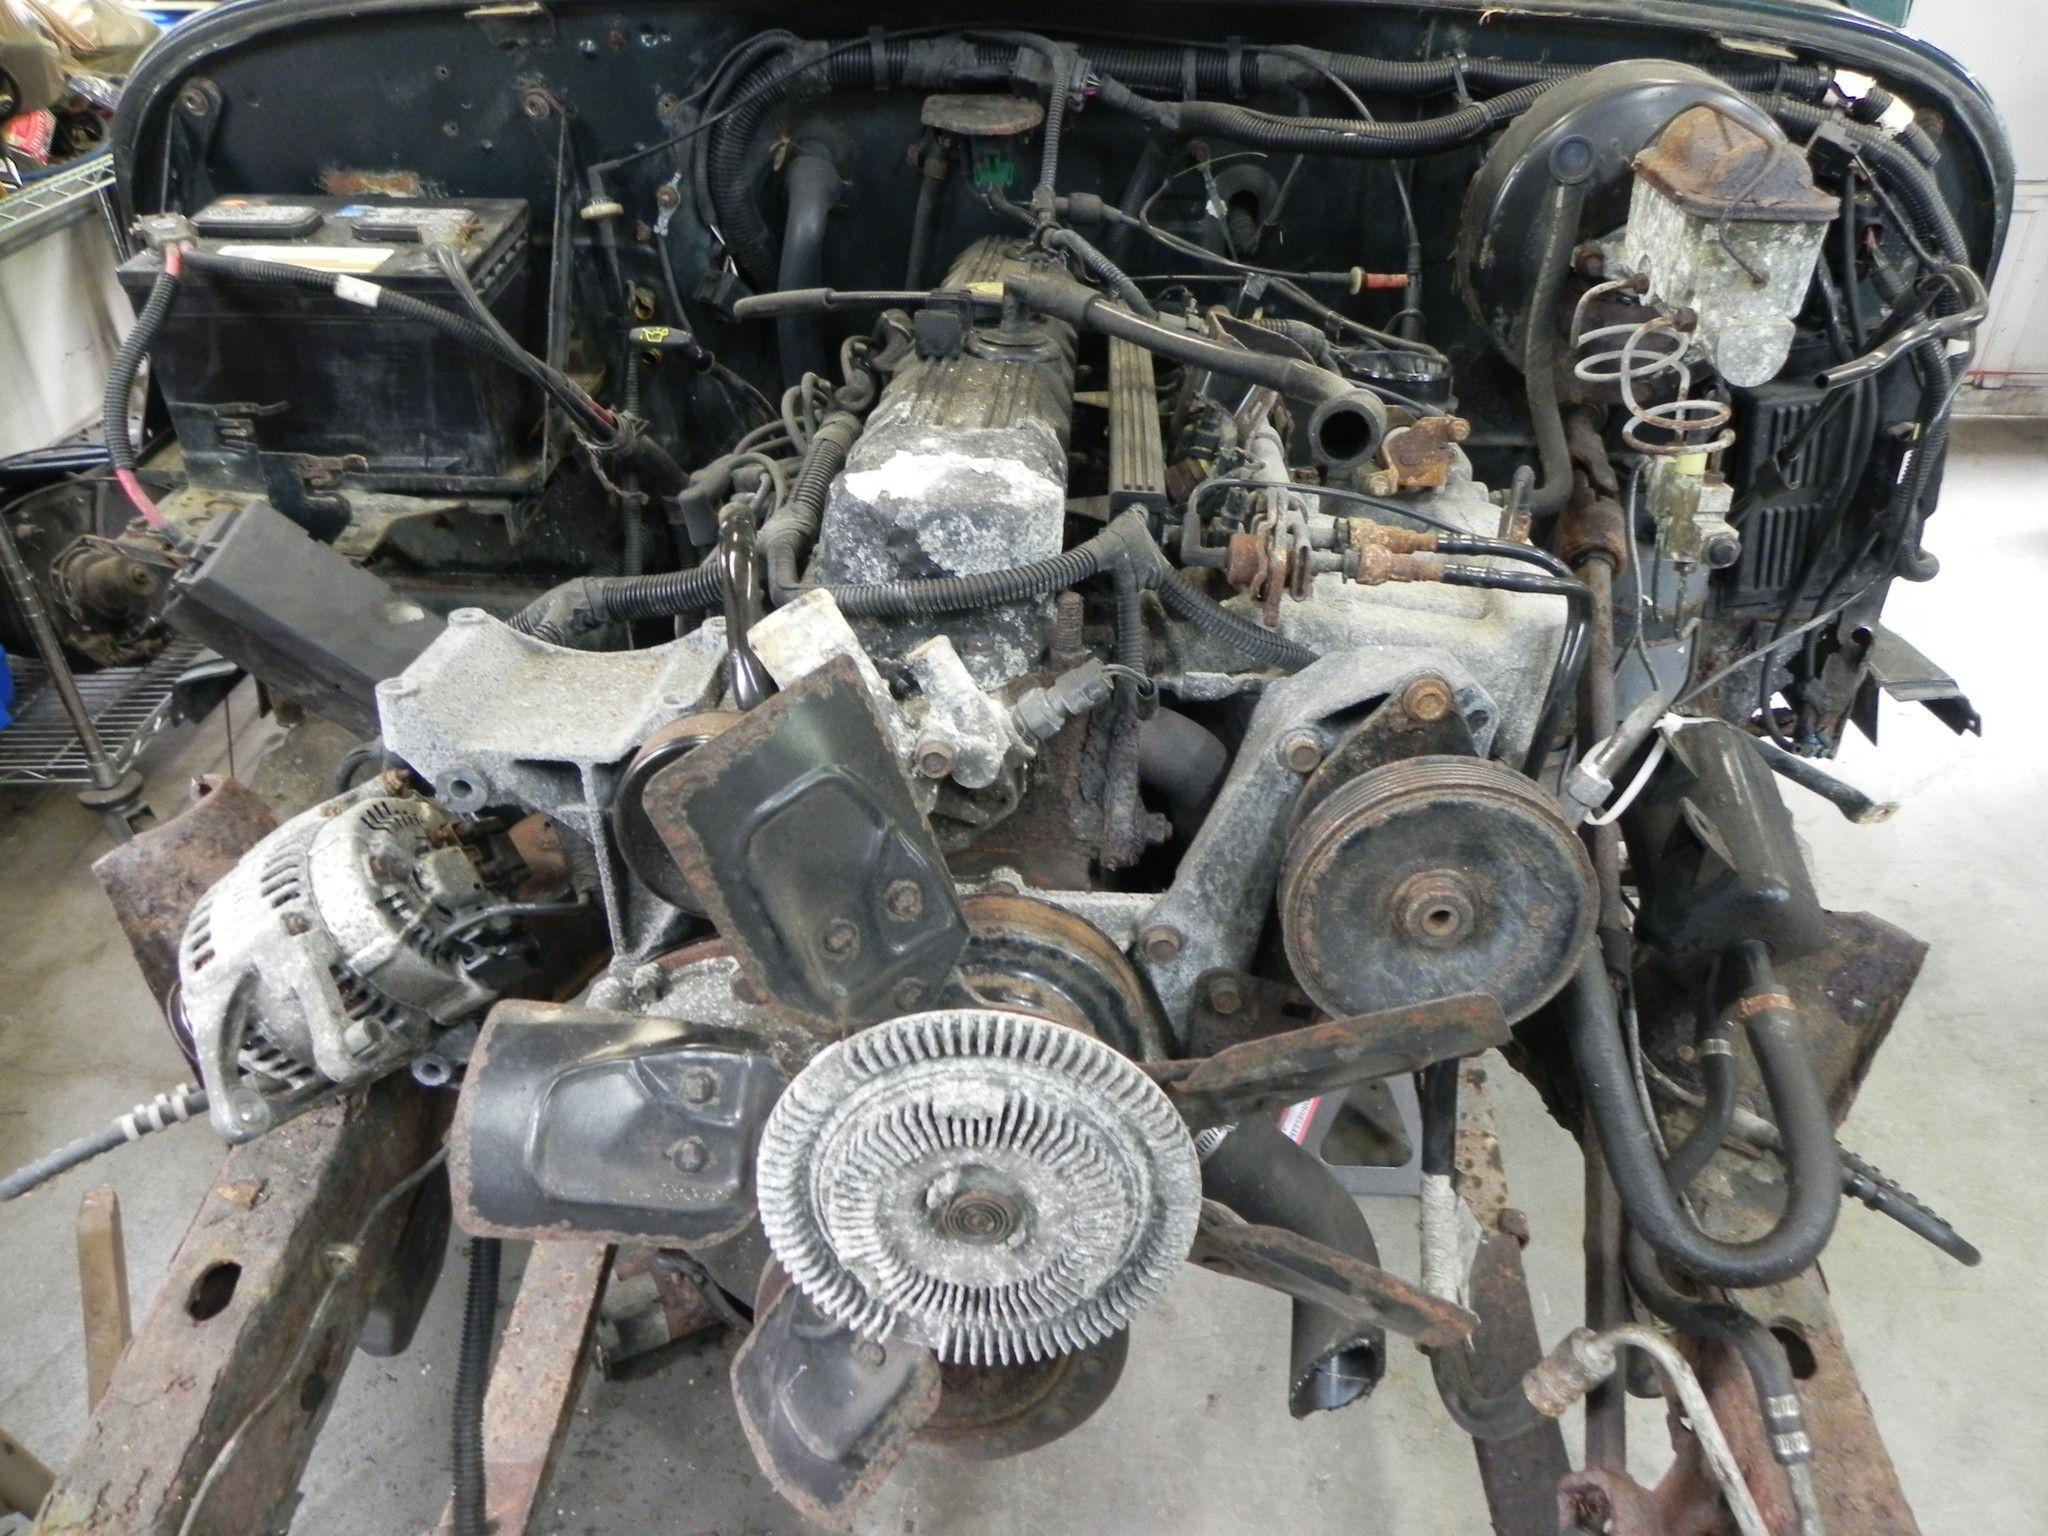 stright 6 jeep yj engine diagram motor 4 0 liter    straight       6    manual 115k miles 1994    jeep     motor 4 0 liter    straight       6    manual 115k miles 1994    jeep